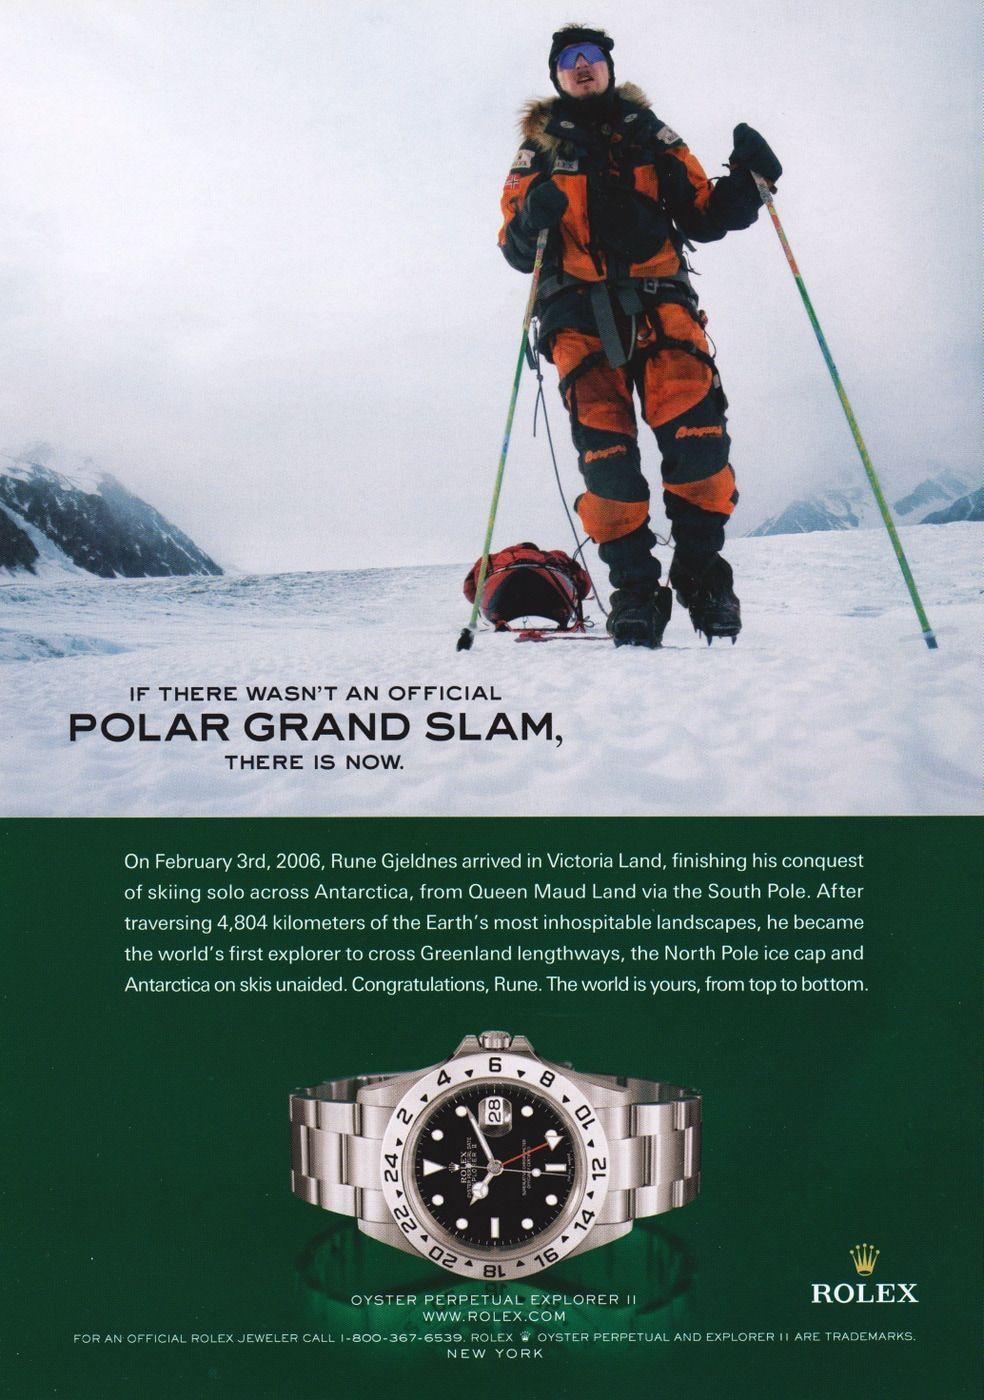 Rolex Explorer II Rune Gjeldnes 2006 Ad | Rolex explorer ii, Rolex explorer, Explore